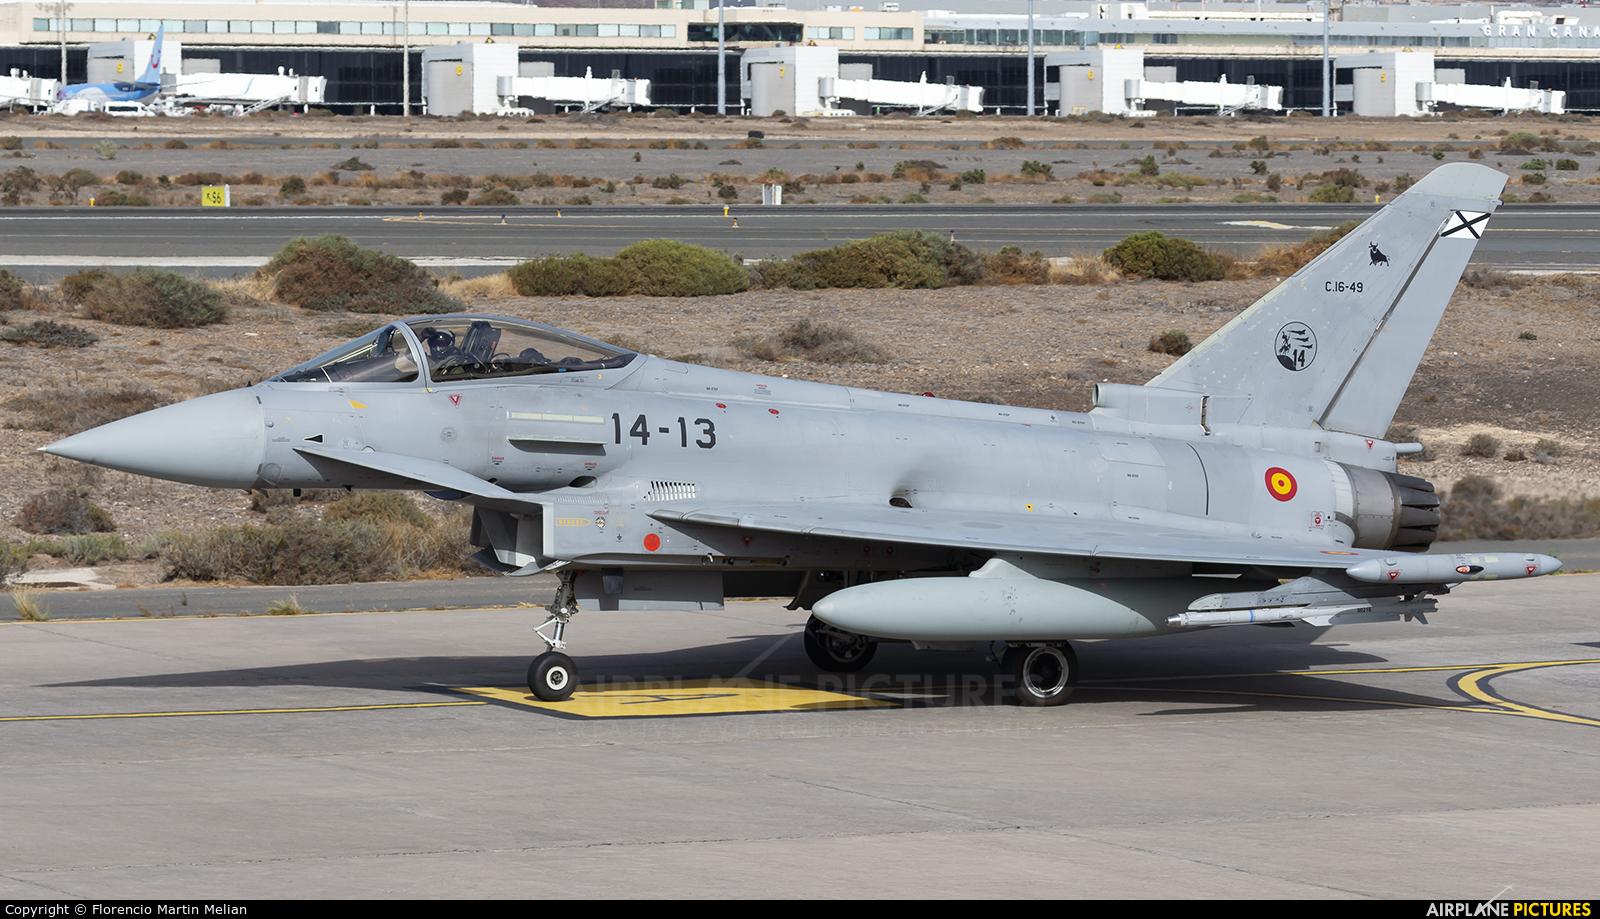 Spain - Air Force C.16-49 aircraft at Aeropuerto de Gran Canaria